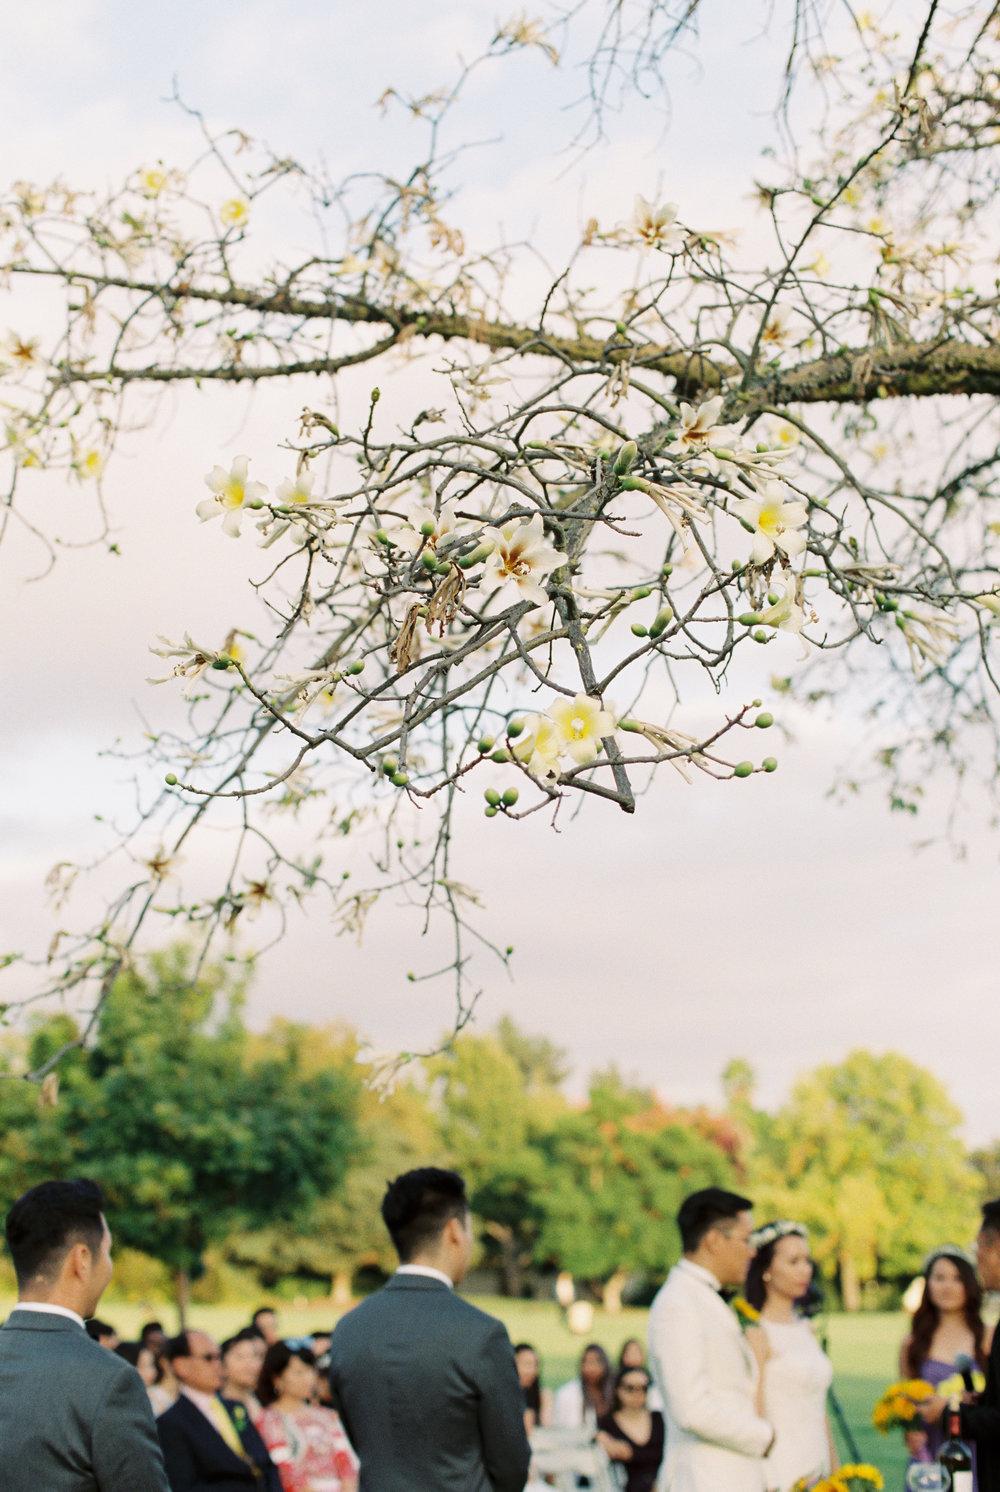 los-angeles-county-arboretum-and-botanic-garden-wedding-photos-photography408.jpg